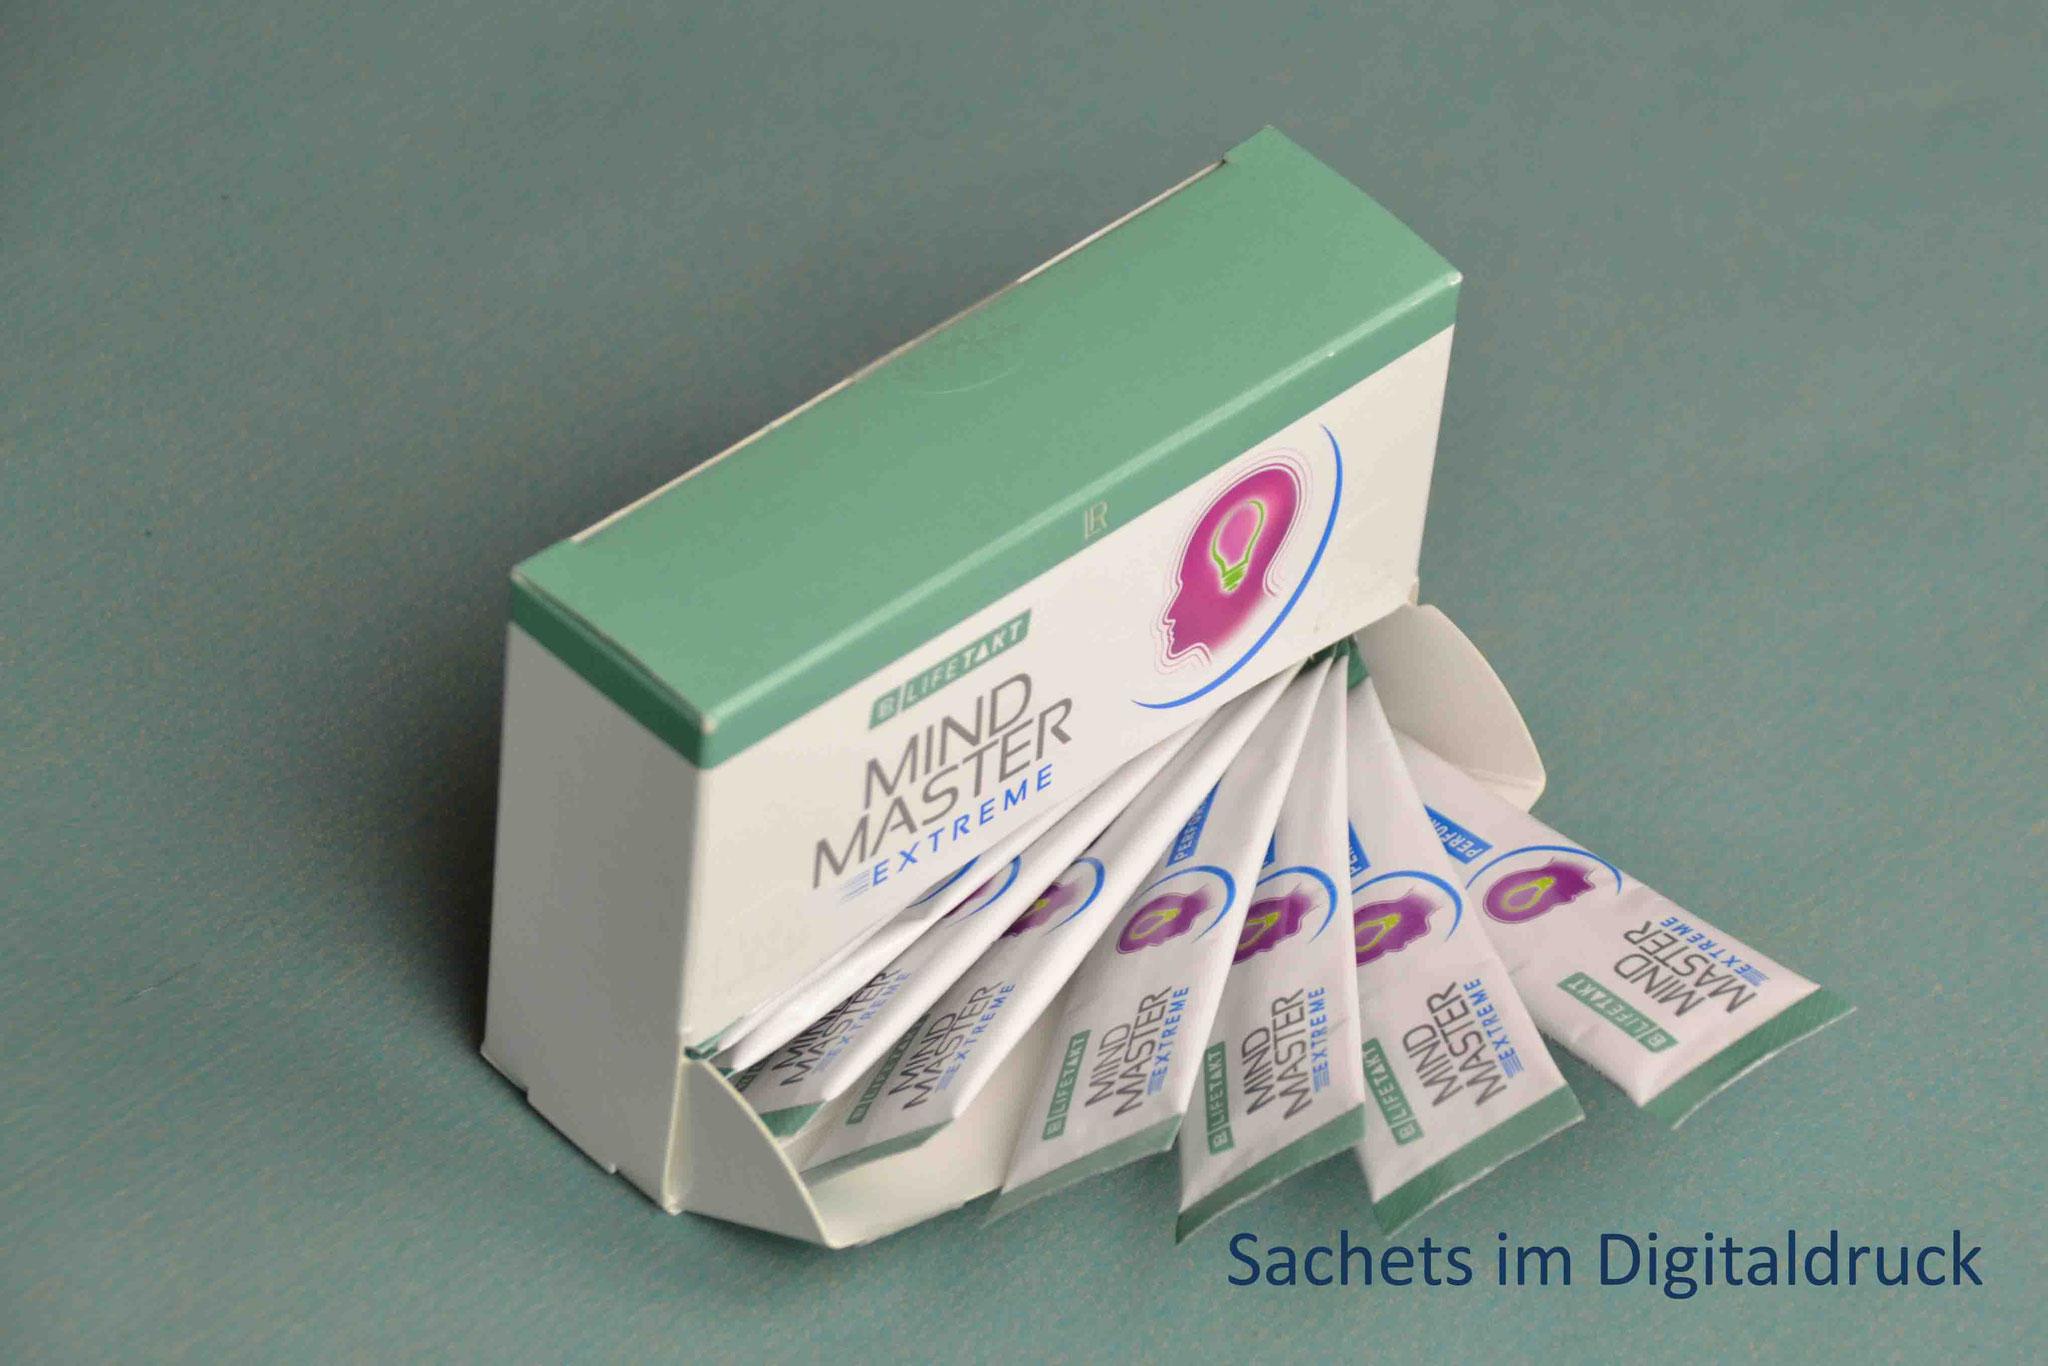 Sachets digitally printed